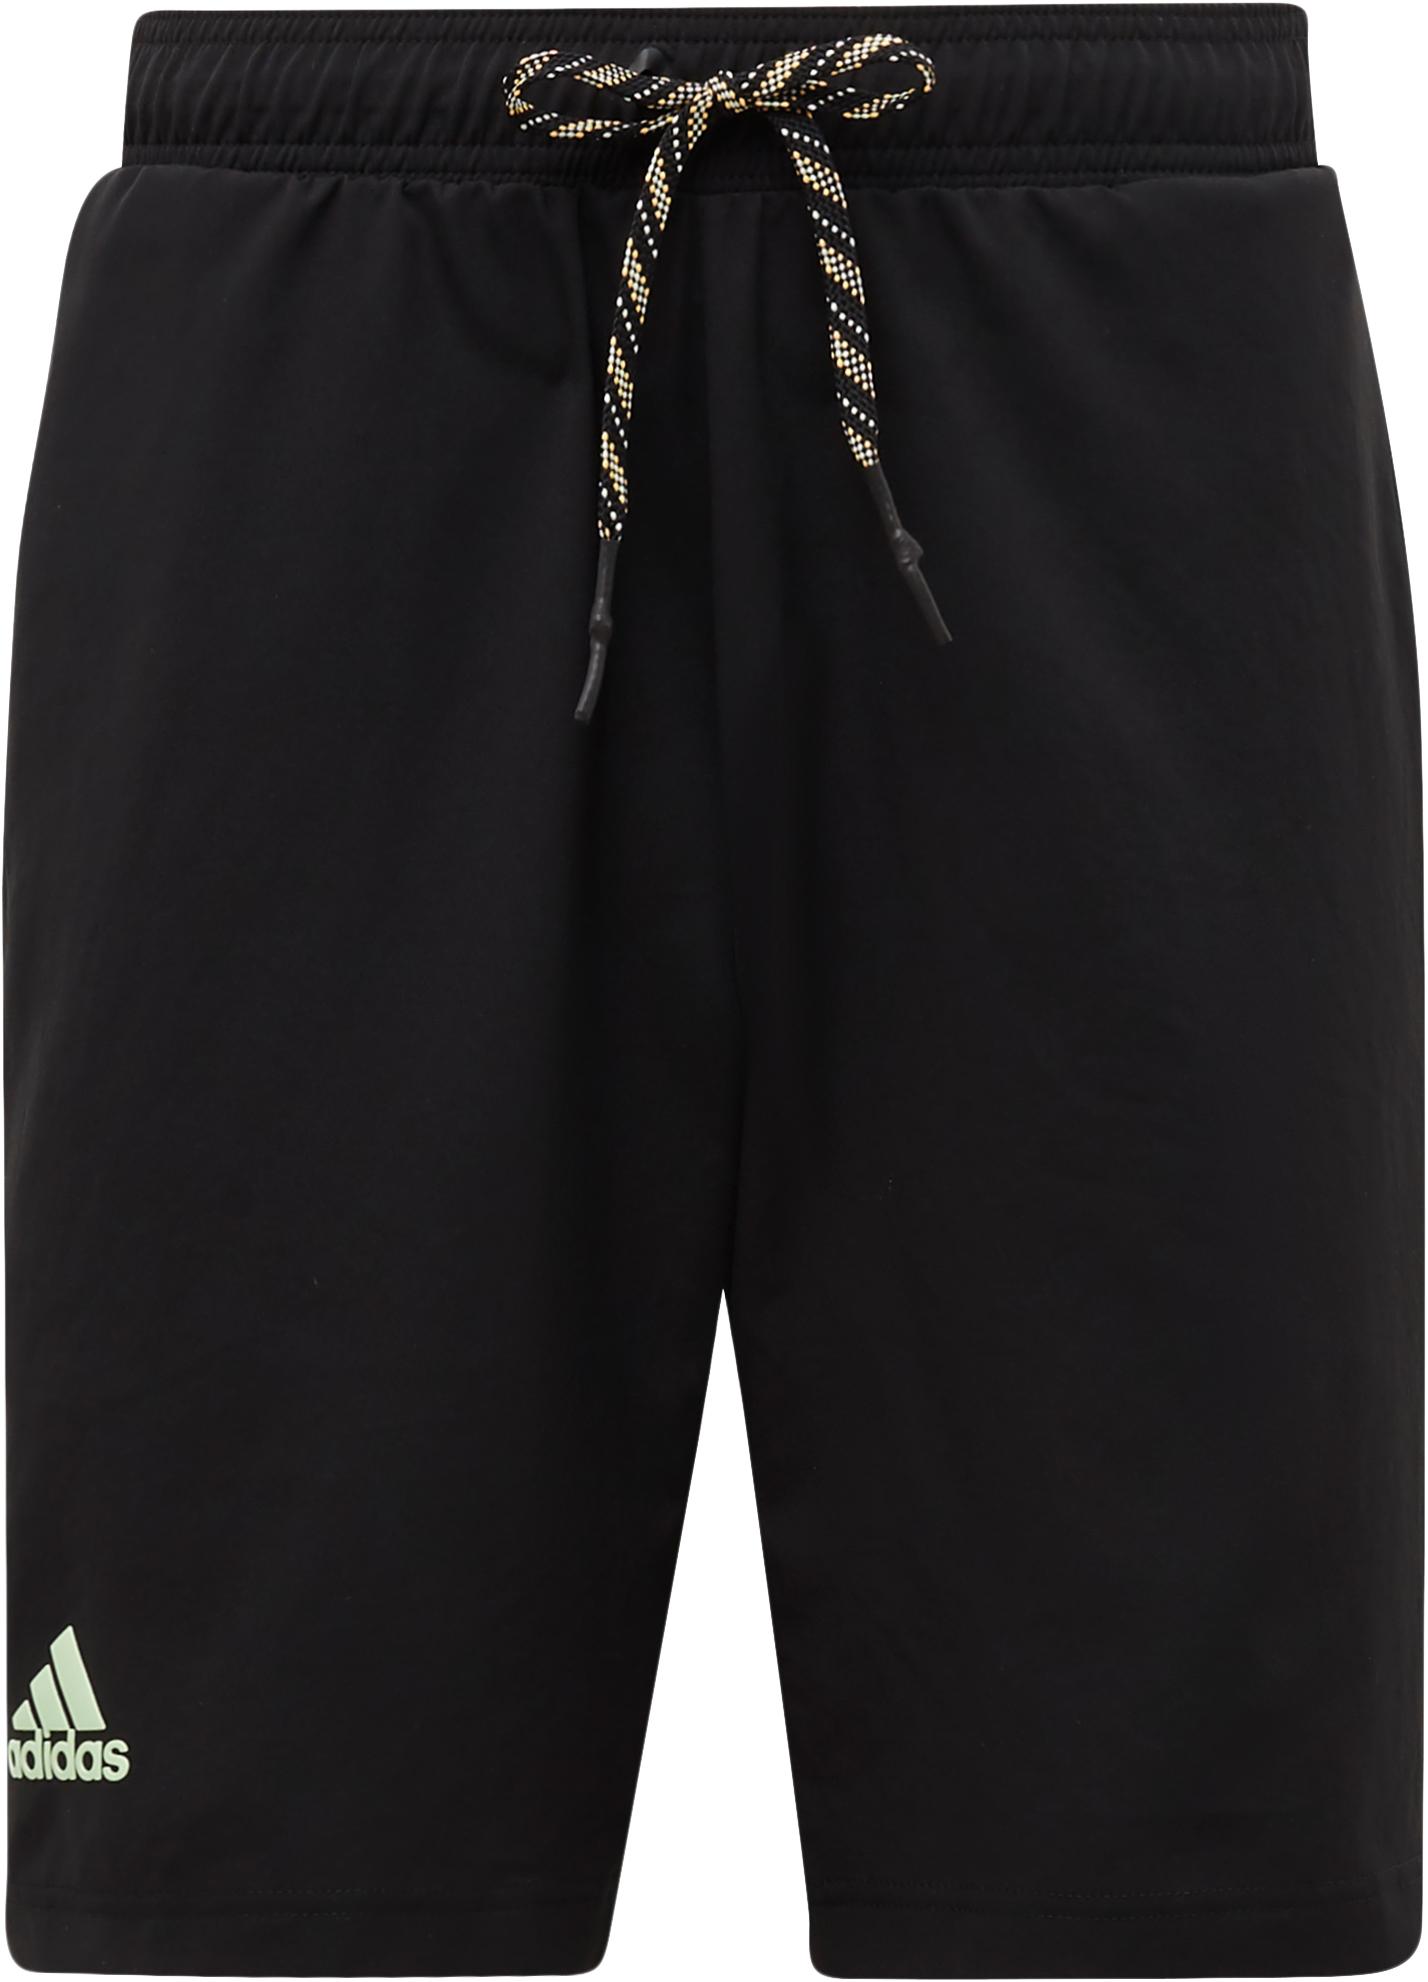 Adidas Шорты мужские Adidas New York, размер 52-54 шорты для тенниса мужские adidas uncontrol climachill цвет черный b45842 размер l 52 54